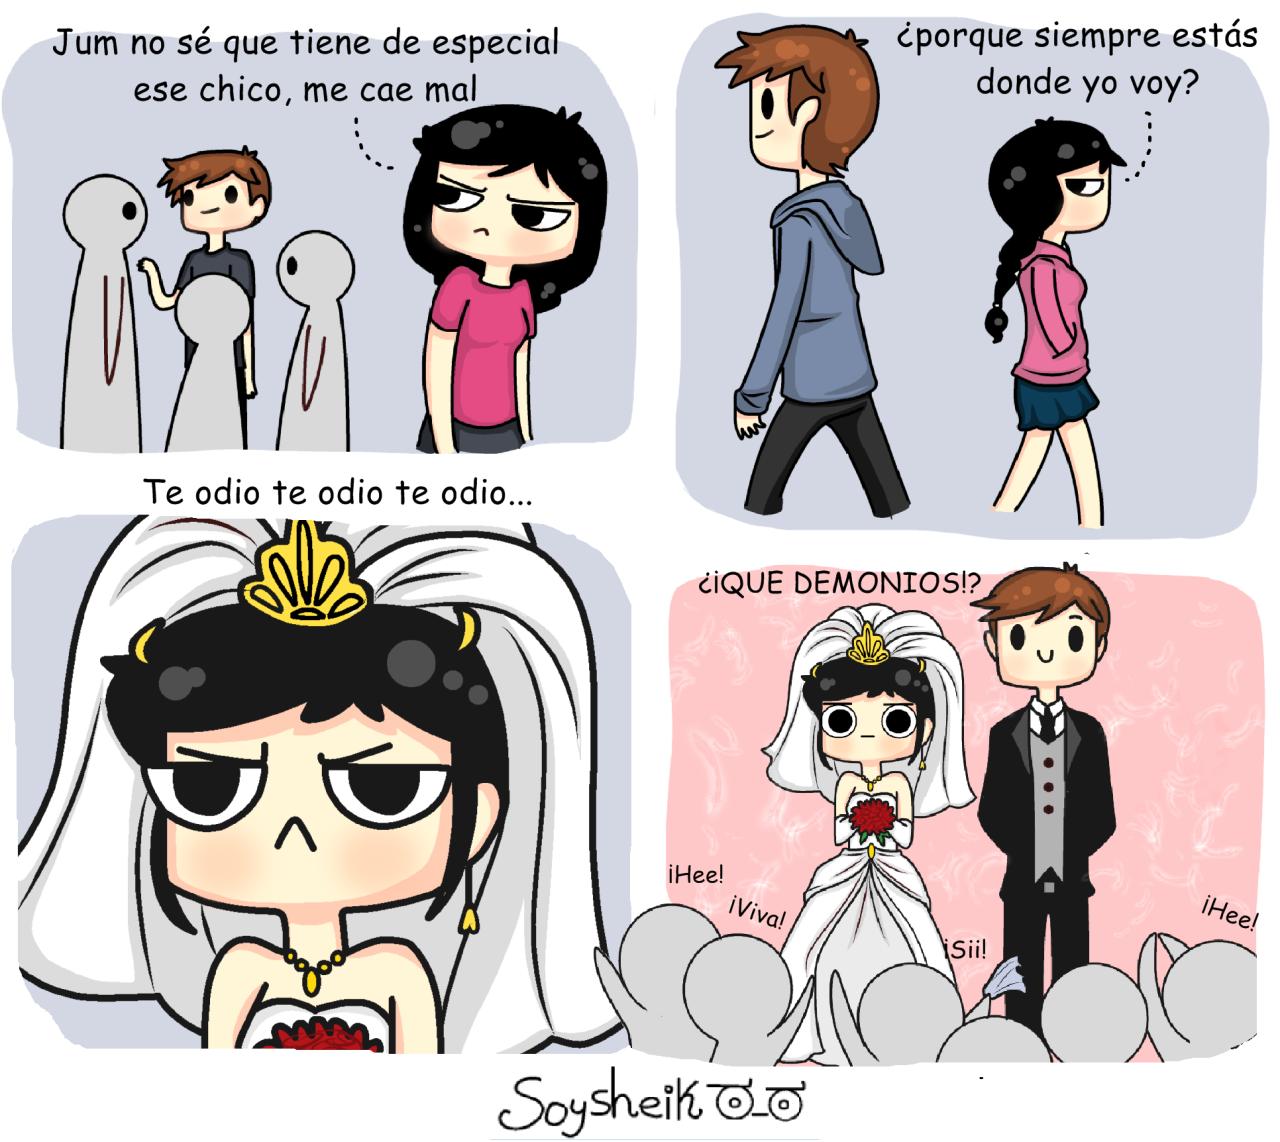 Soysheik Amor Odio Comics Graciosos Memes Divertidos Memes